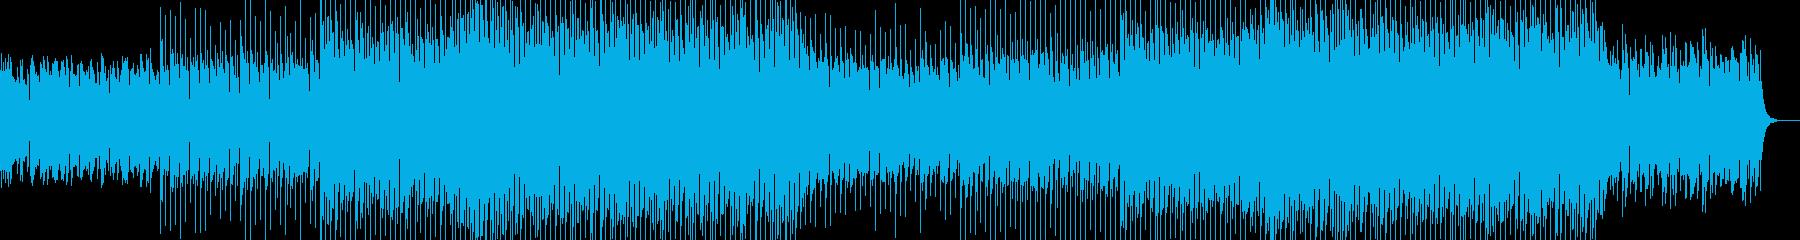 EDMクラブ系ダンスミュージック-29の再生済みの波形